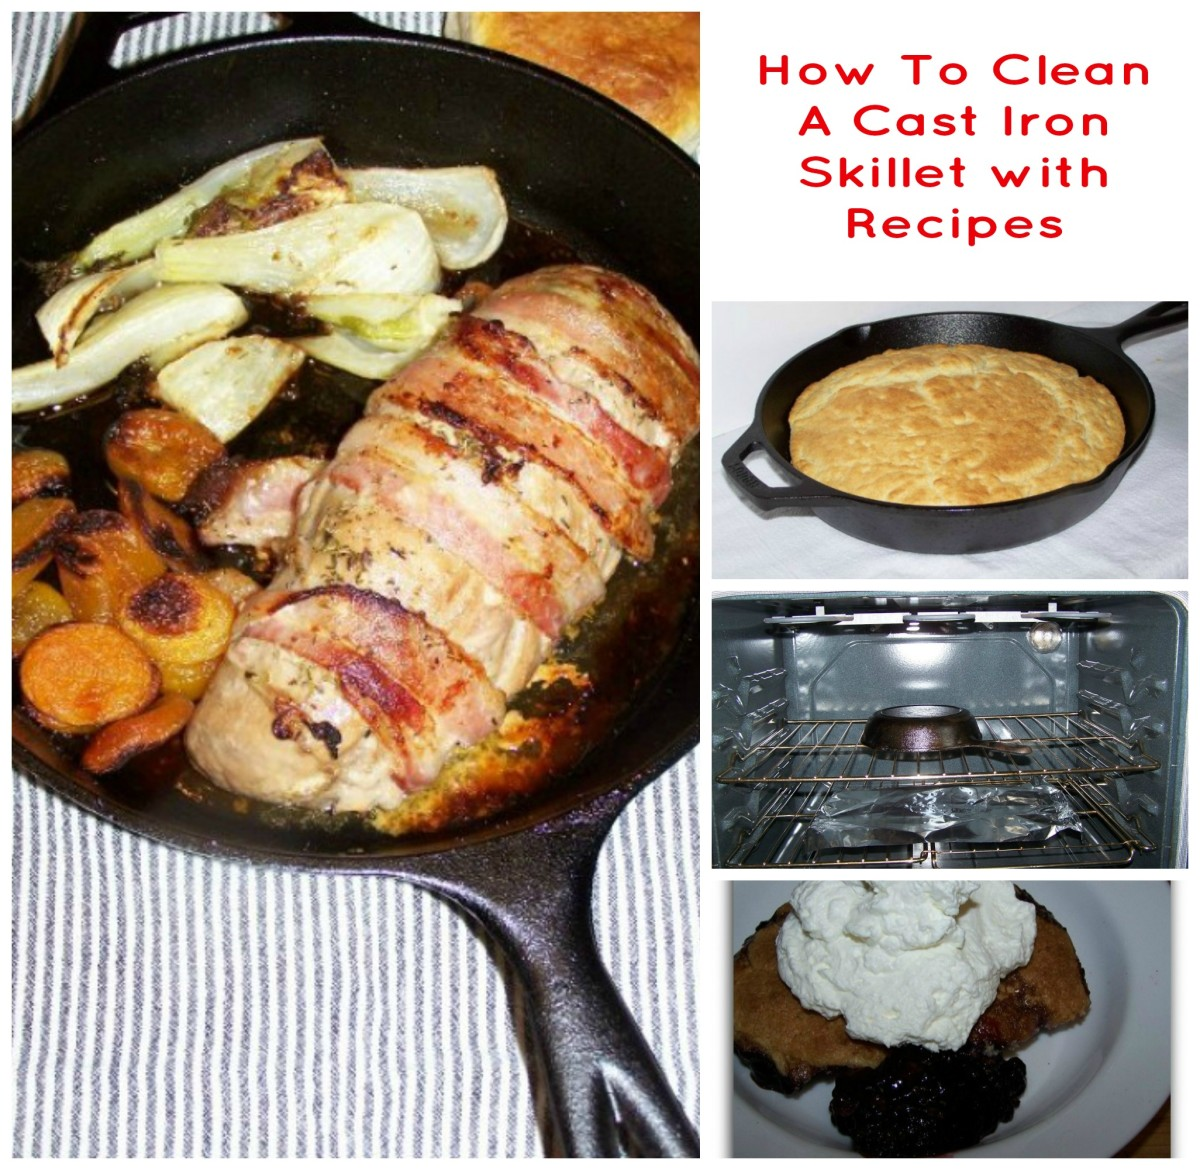 Cast Iron Skillet & Pan Recipes, Blackberry Cobbler and Bacon Wrapped Pork Tenderloin. Clean & Season Cast Iron Skillet.